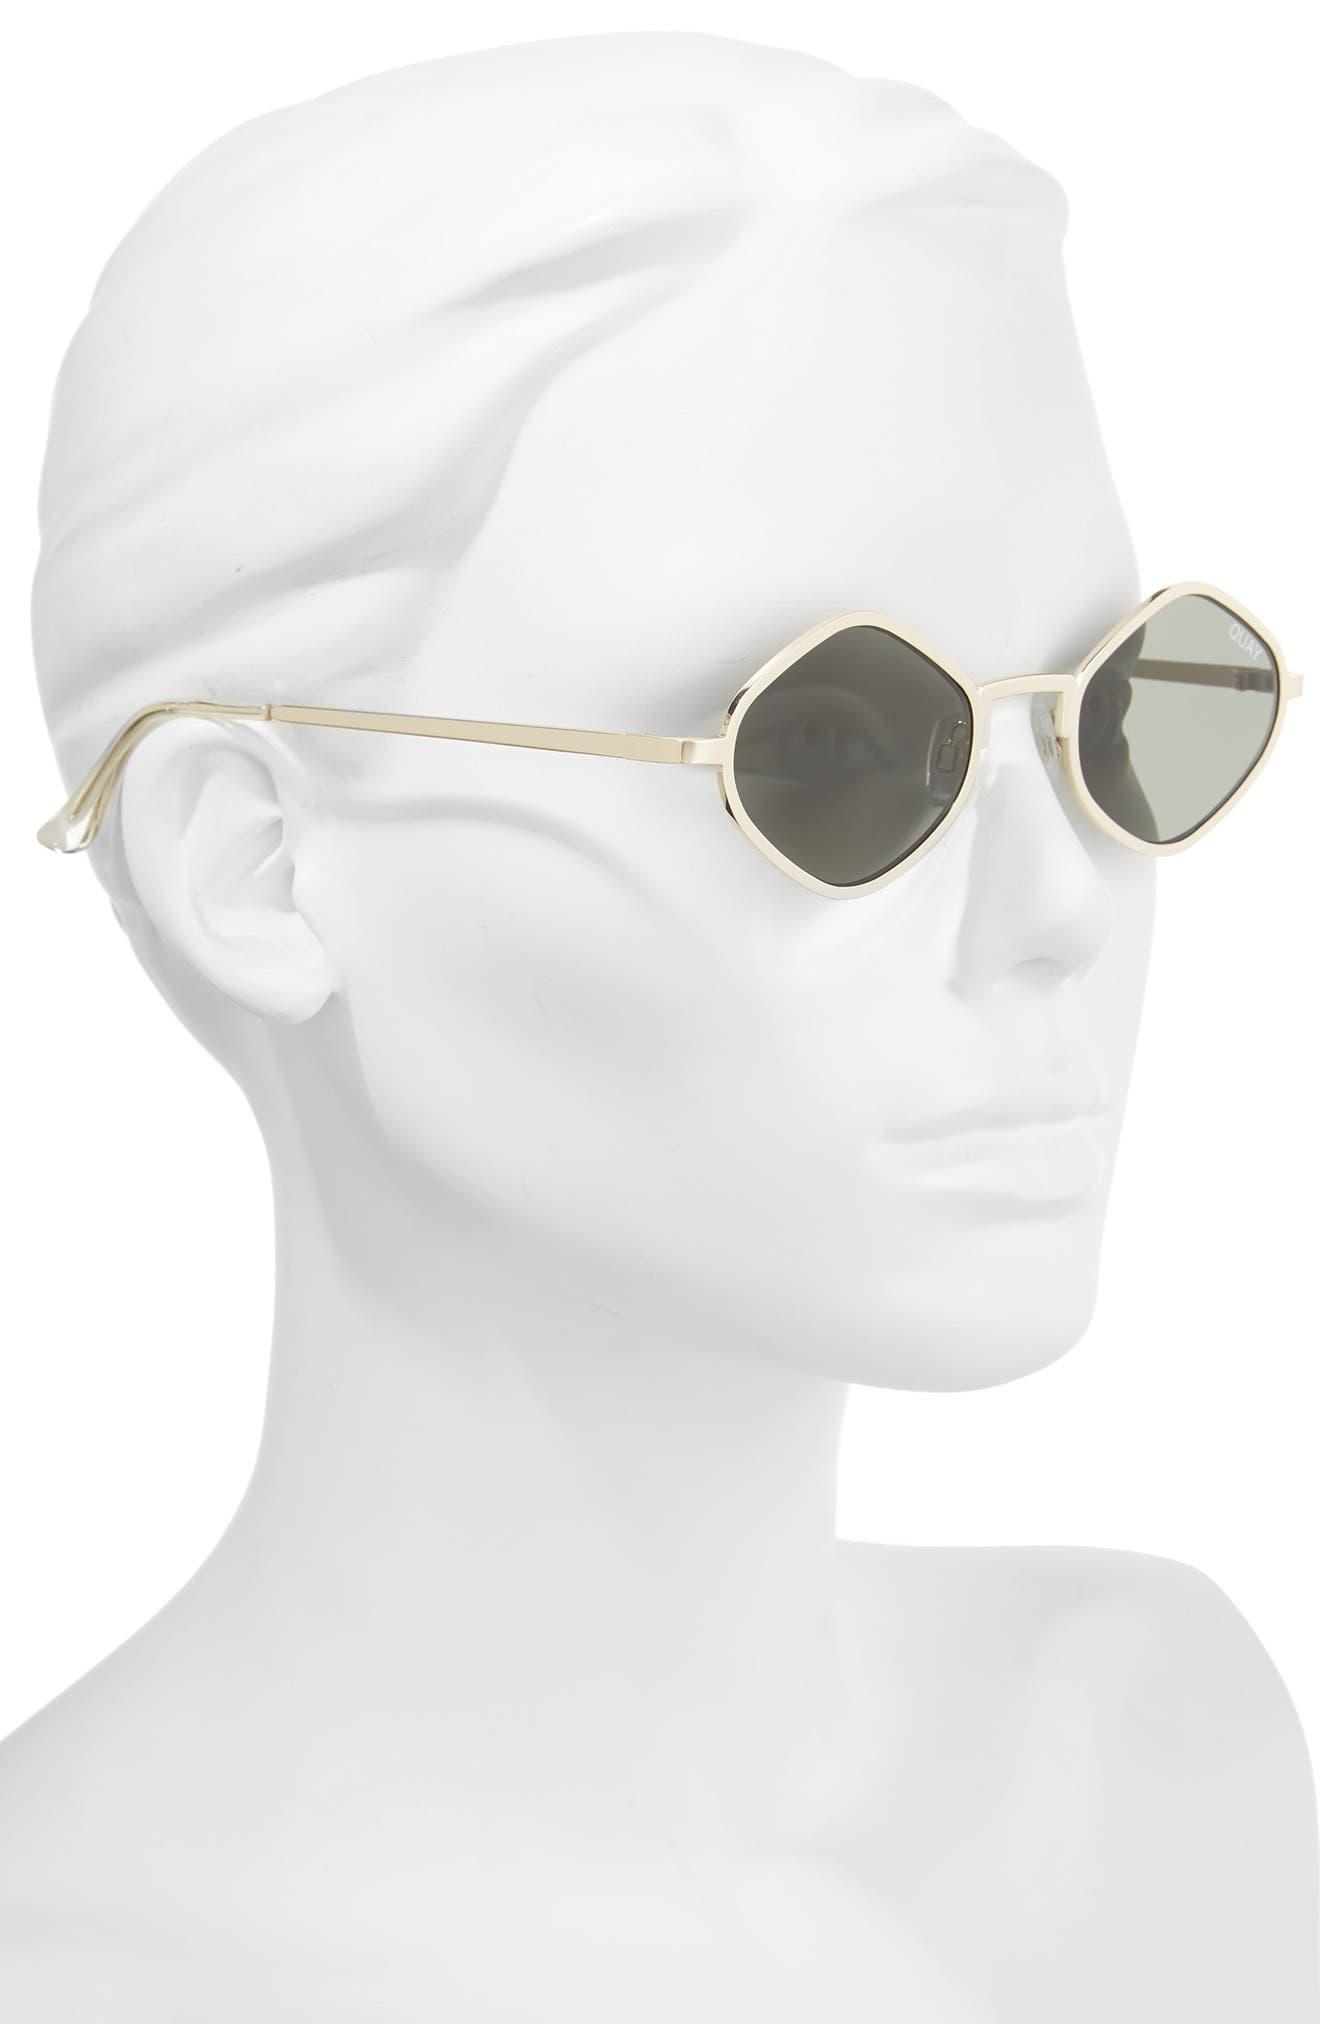 Purple Honey 48mm Geo Sunglasses,                             Alternate thumbnail 2, color,                             Gold/ Green